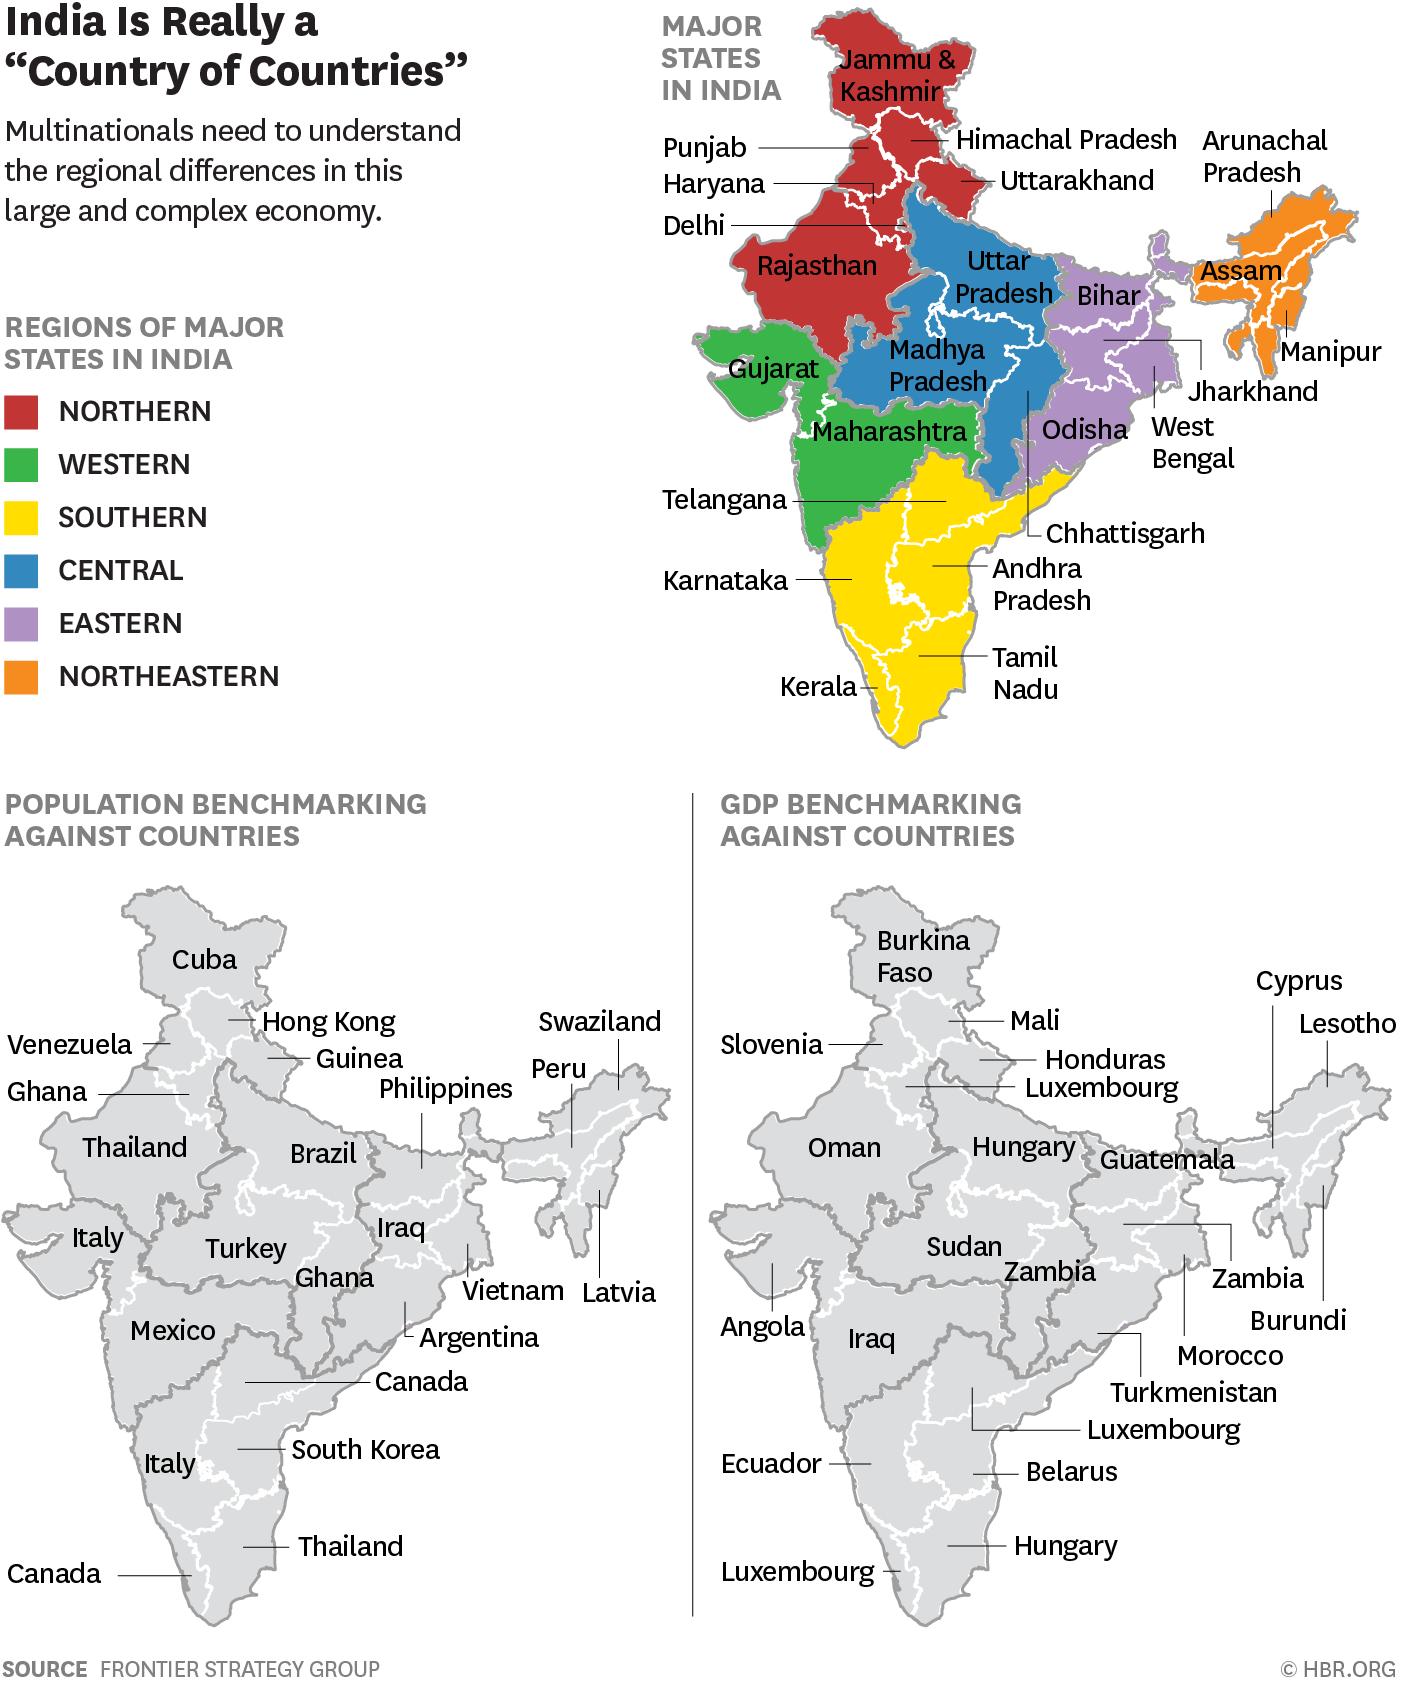 W171201_SINGH_INDIAIS.png